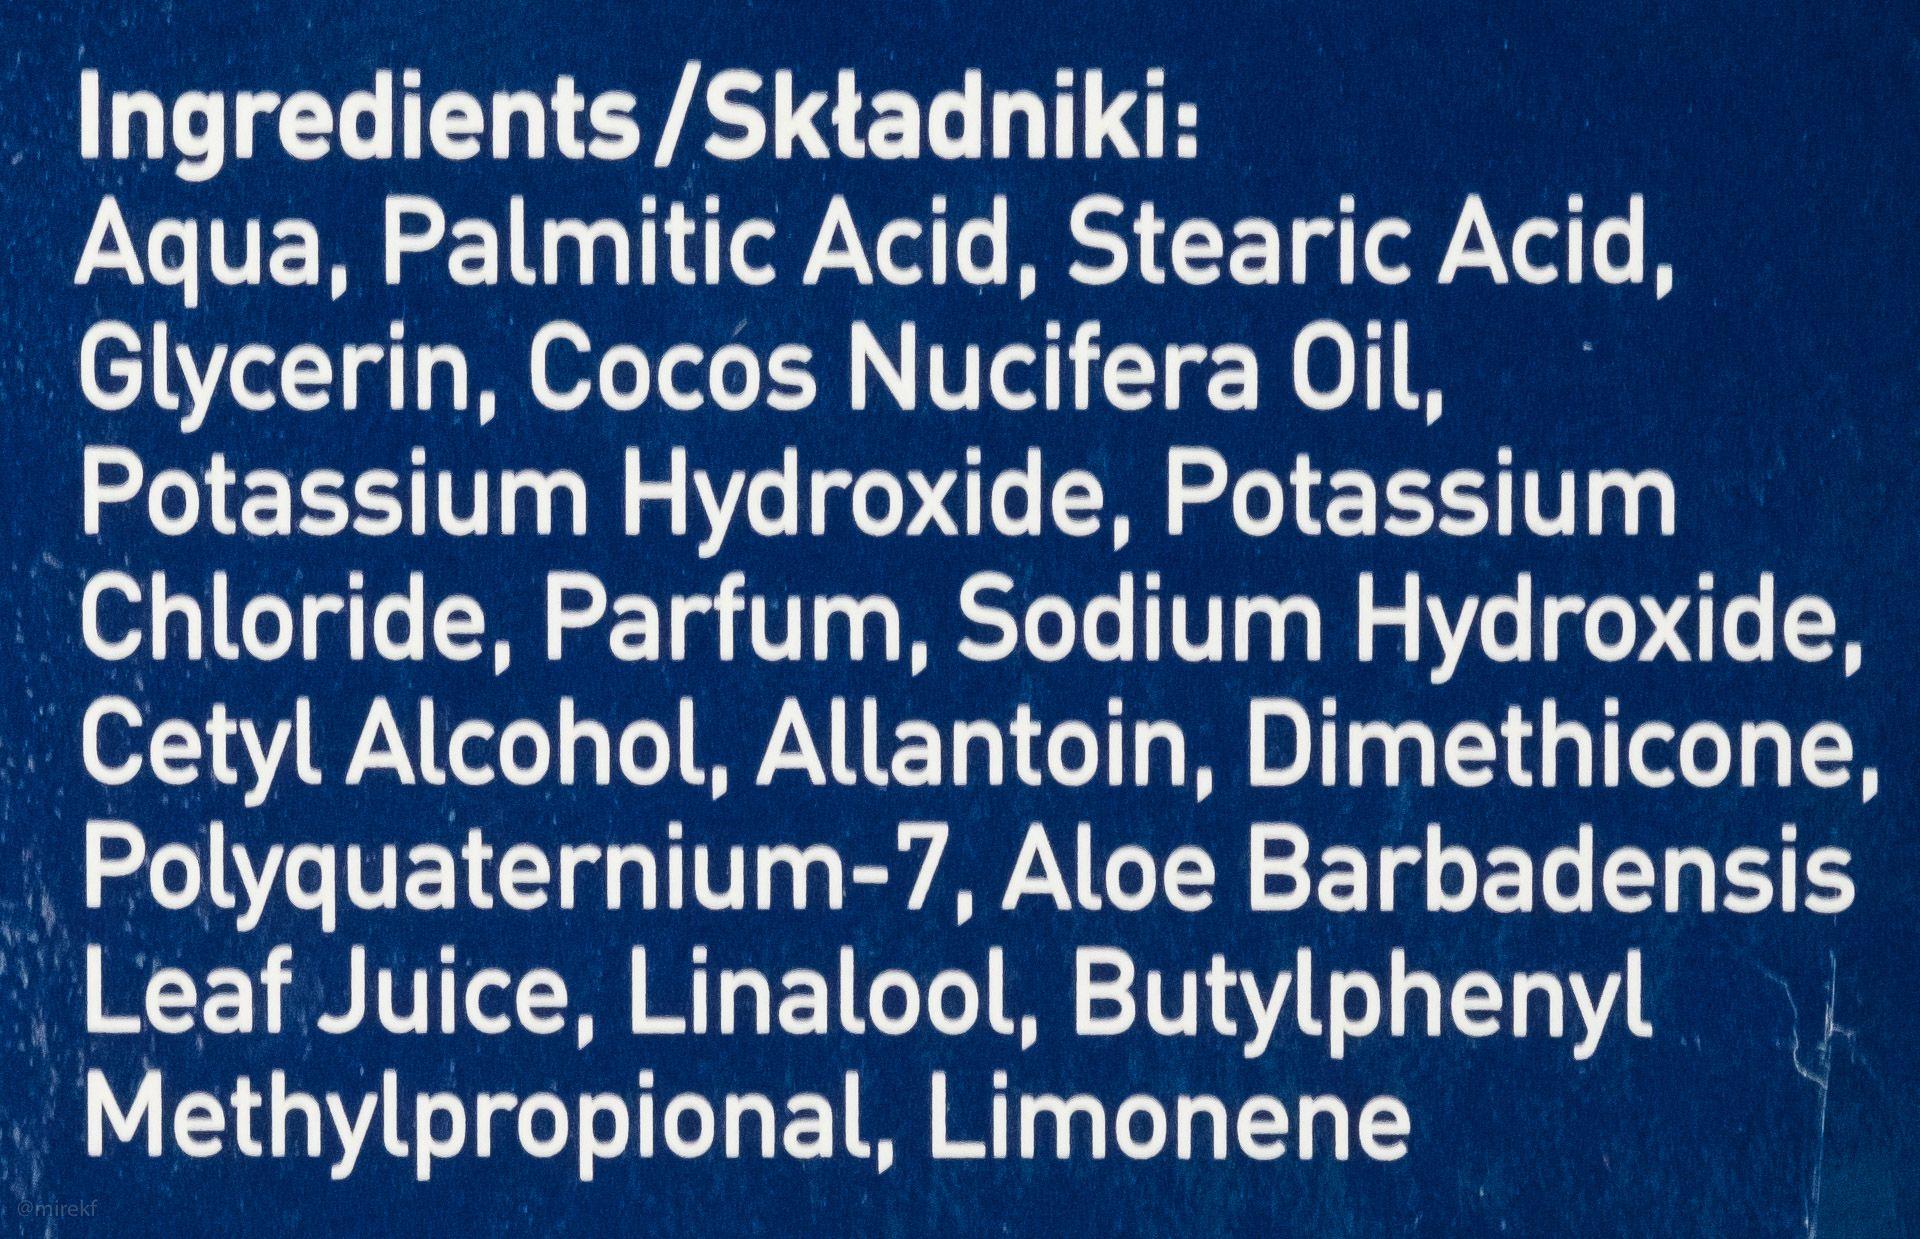 Skład (INCI ingredients) kremu do golenia Wilkinson Sword Rasiercreme (Shaving Cream)